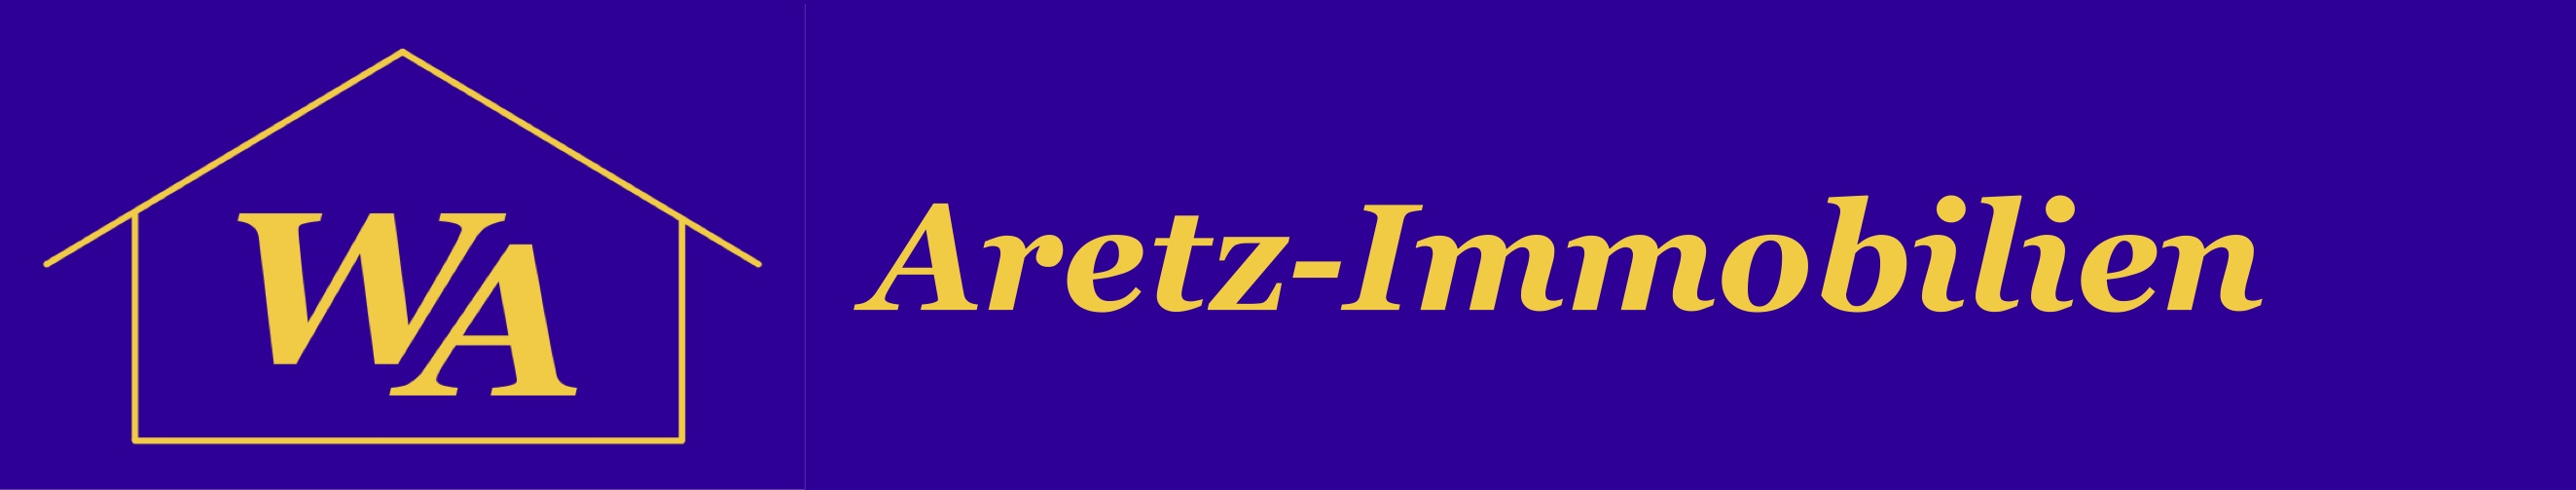 Aretz-Immobilien Gran Canaria